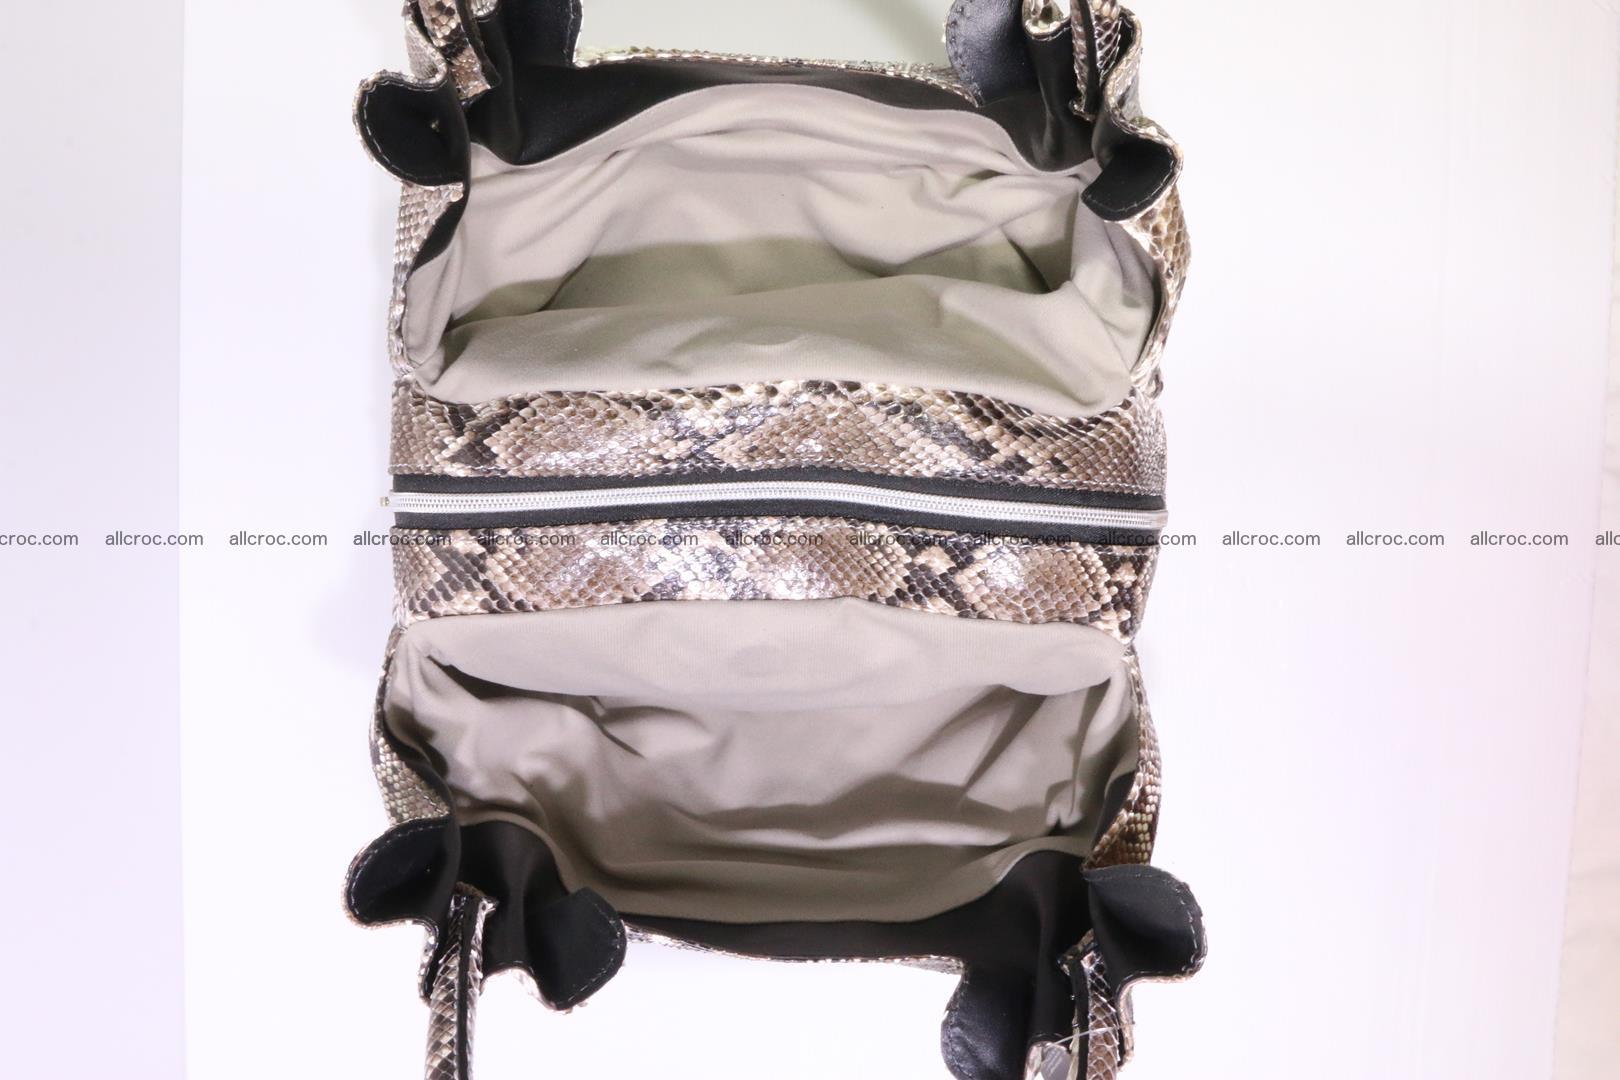 Python skin handbag for lady from genuine Python skin 202 Foto 9